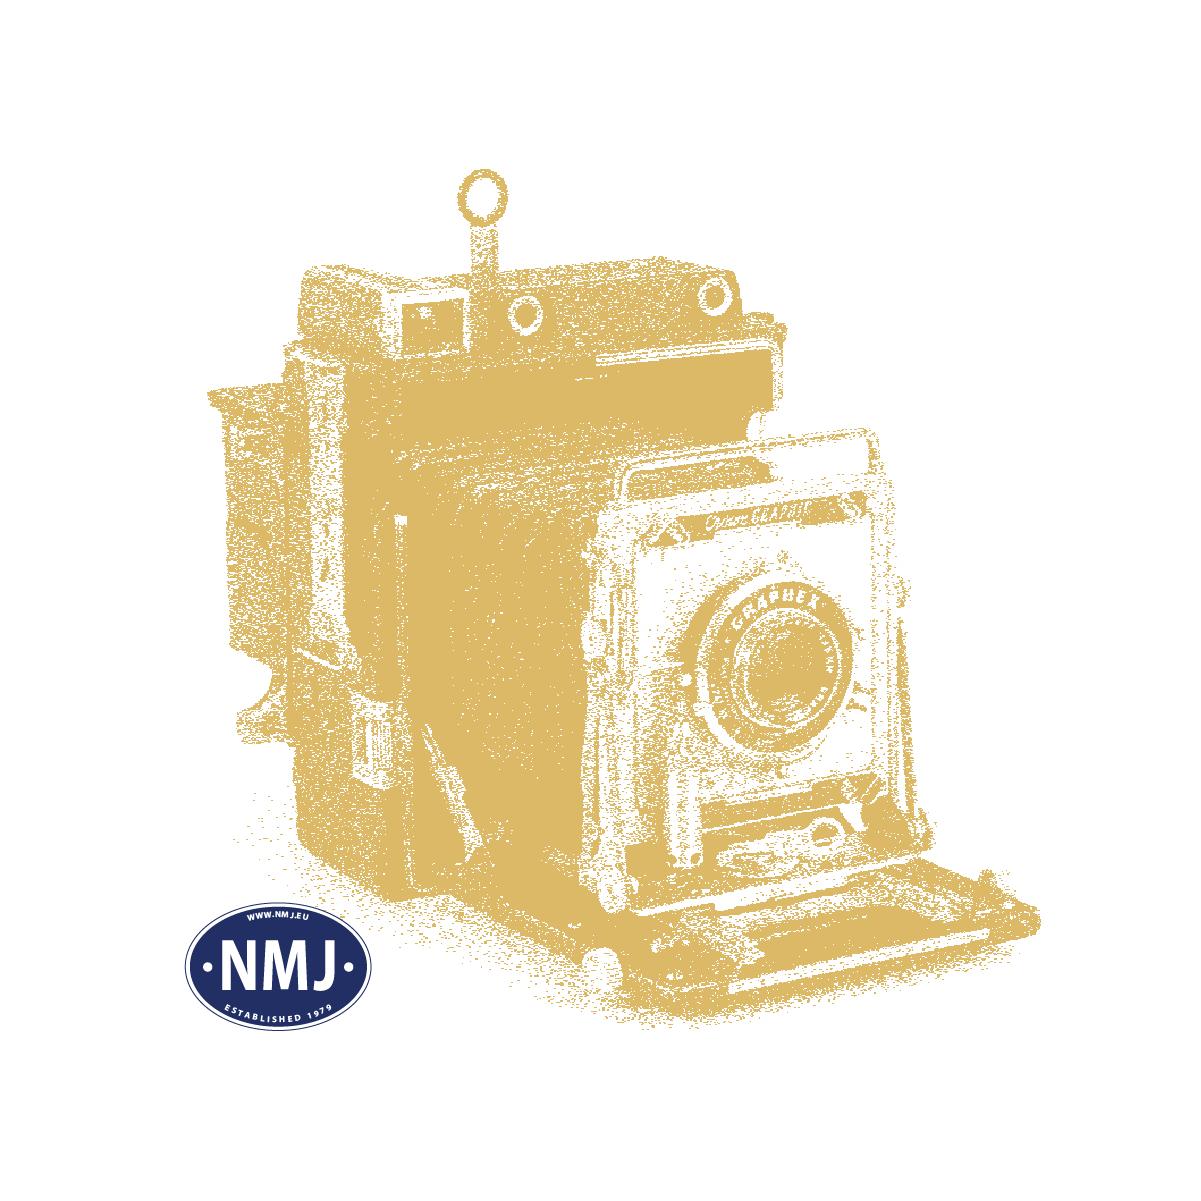 WAL38018 - #18 Kadee for NEM 362, Medium, 4 Stk